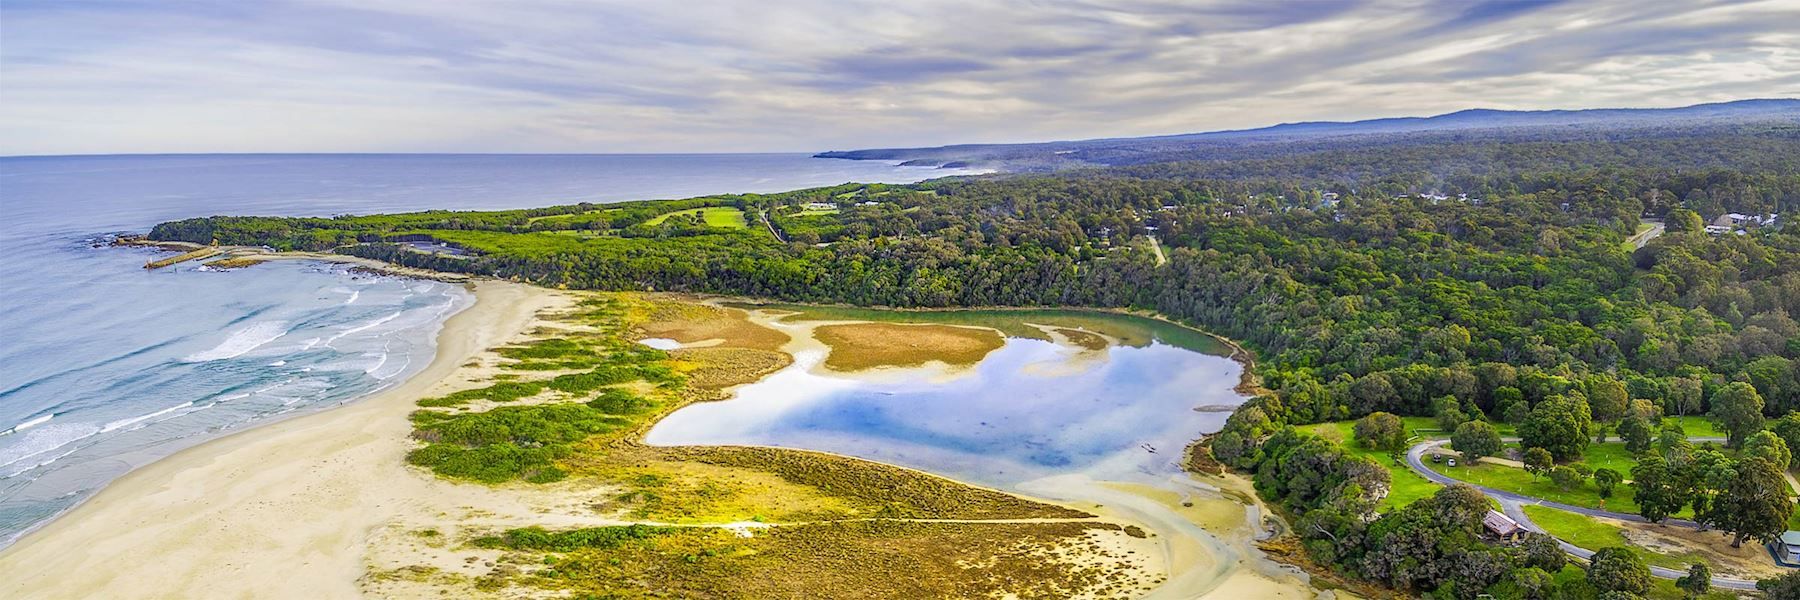 Visit Croajingolong National Park, Australia